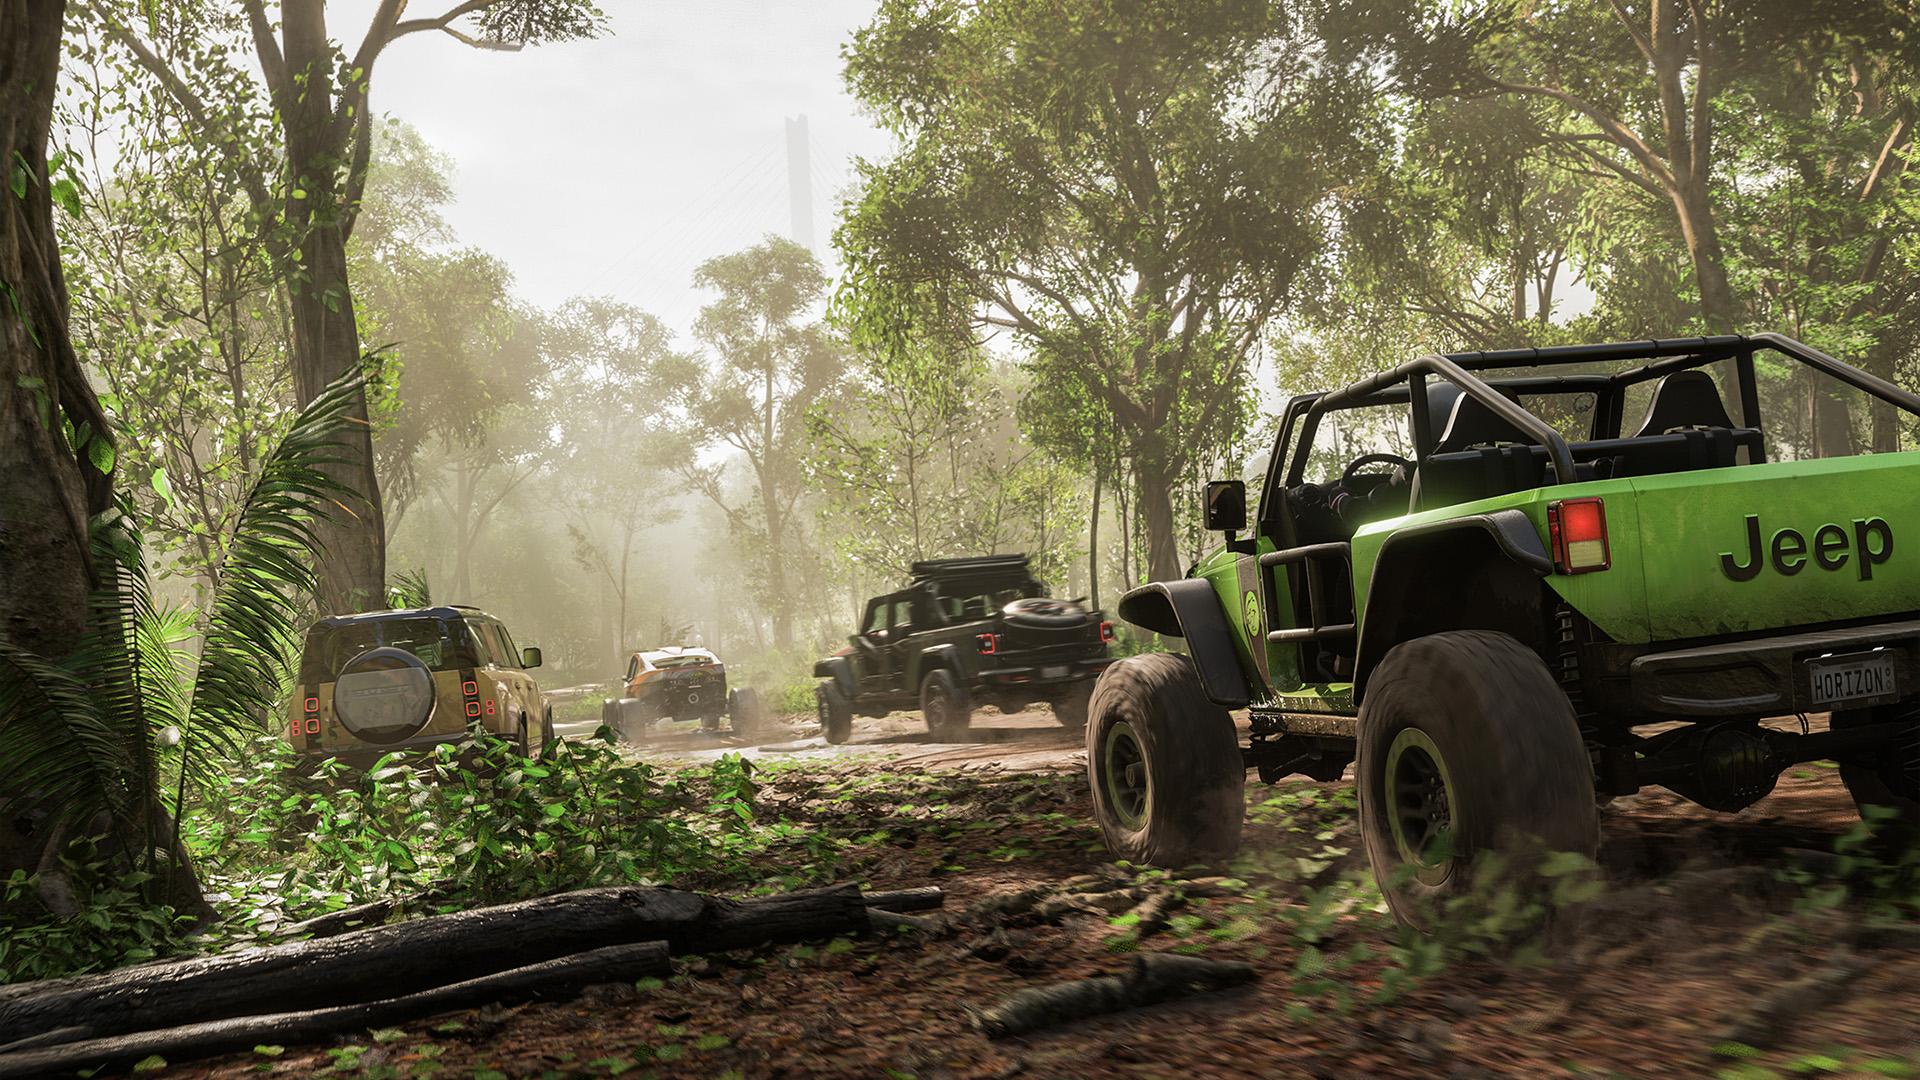 Forza Horizon 5 cars in a jungle environment